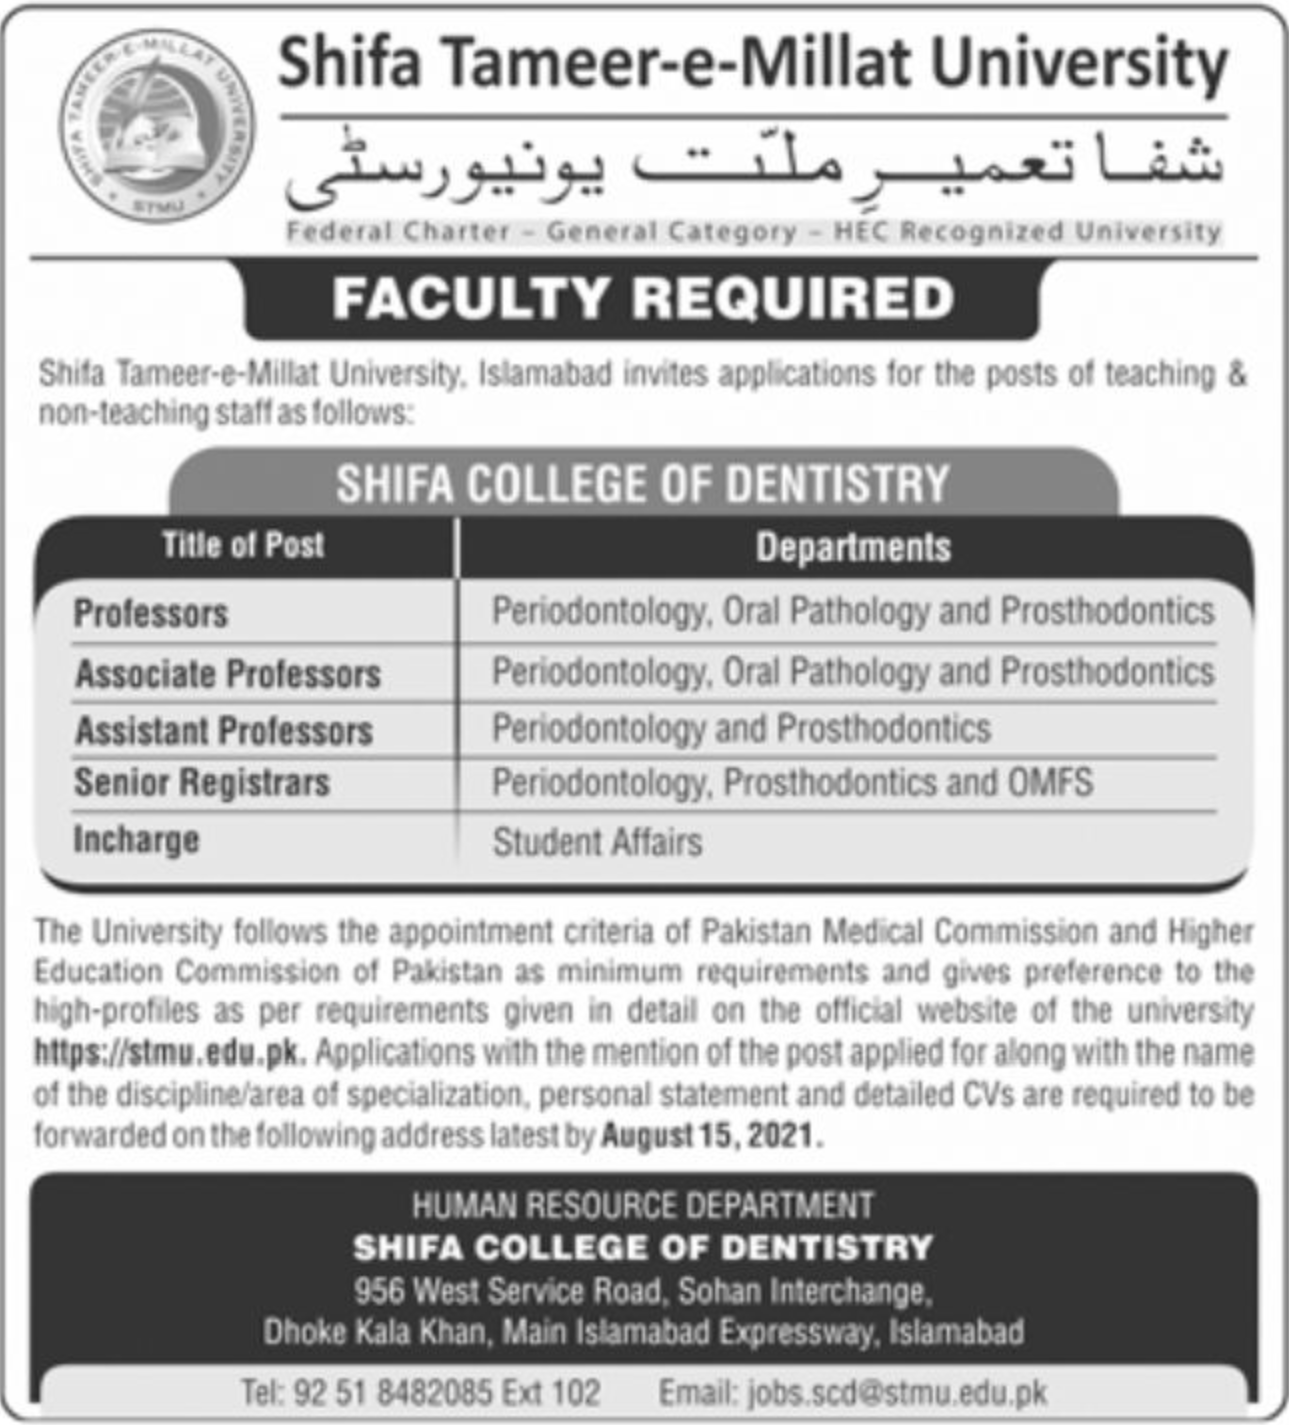 Shifa Tameer-e-Millat University Vacancies 2021 3